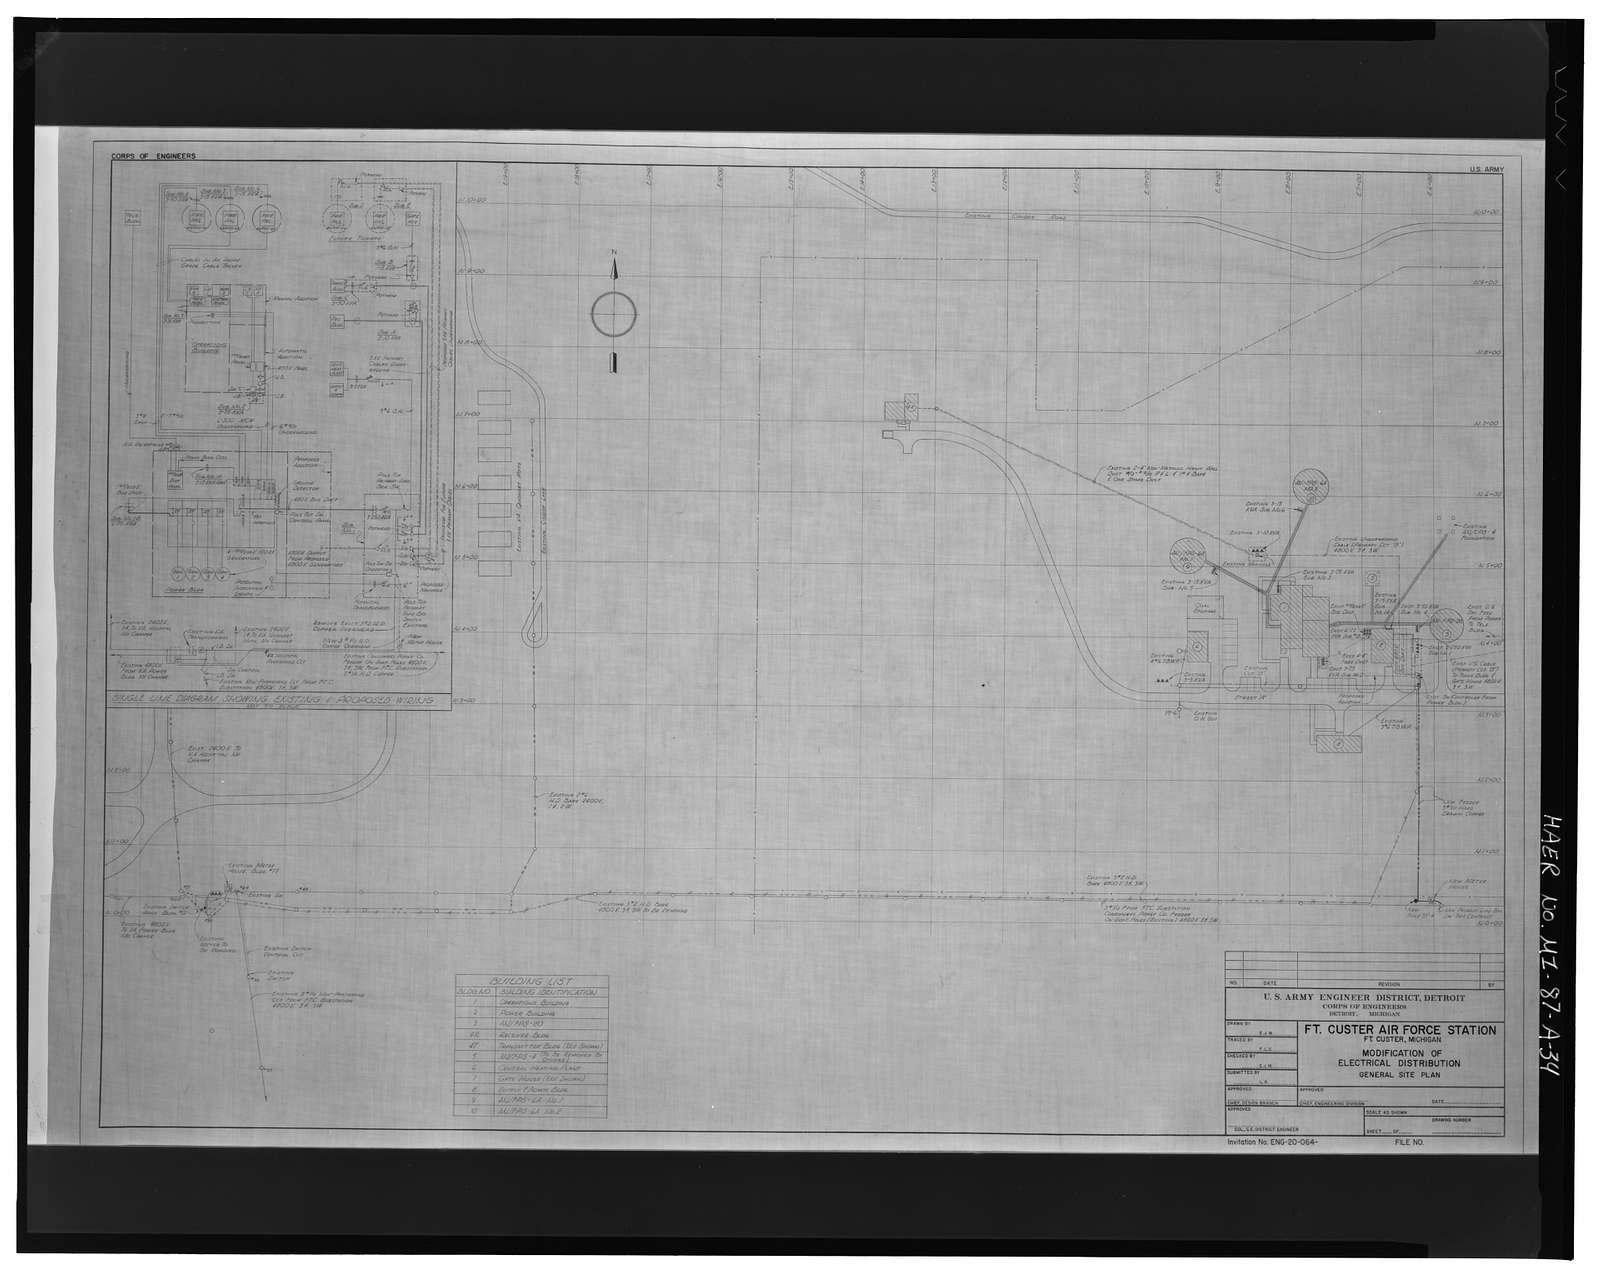 Fort Custer Military Reservation, P-67 Radar Station, .25 mile north of Dickman Road, east of Clark Road, Battle Creek, Calhoun County, MI